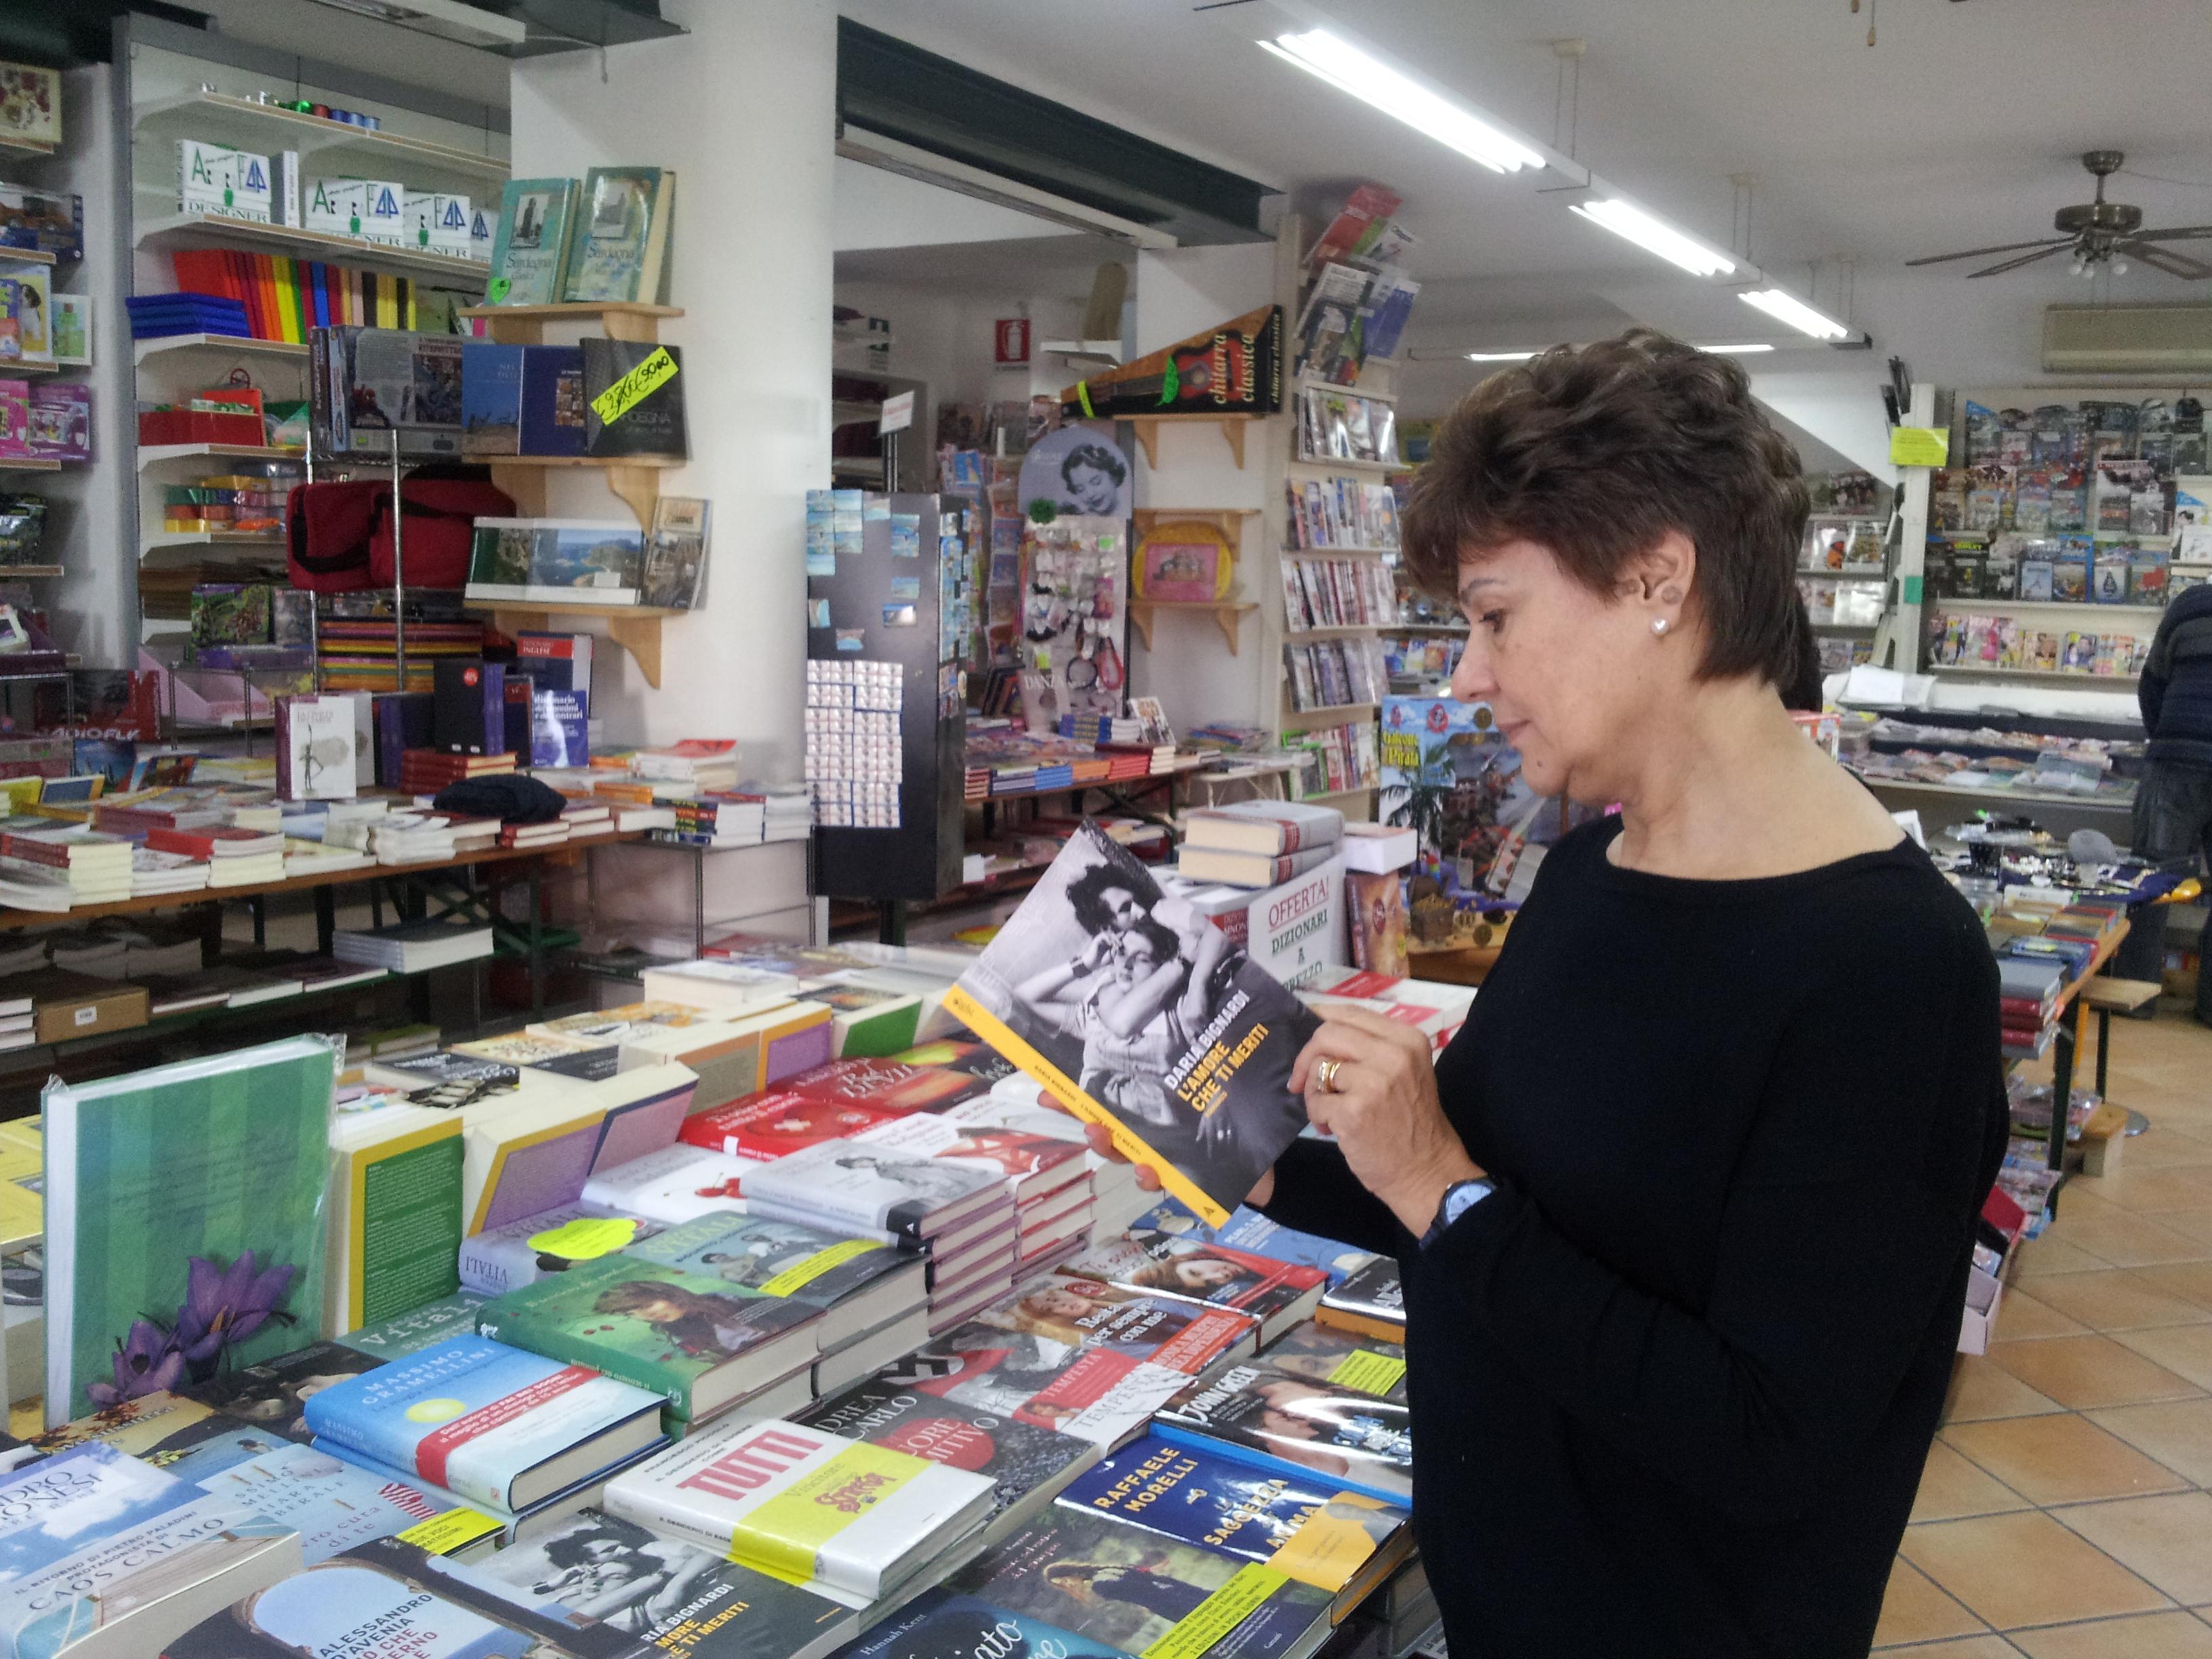 Libreria Roggero, wellbeing activist in Santa Teresa di Gallura